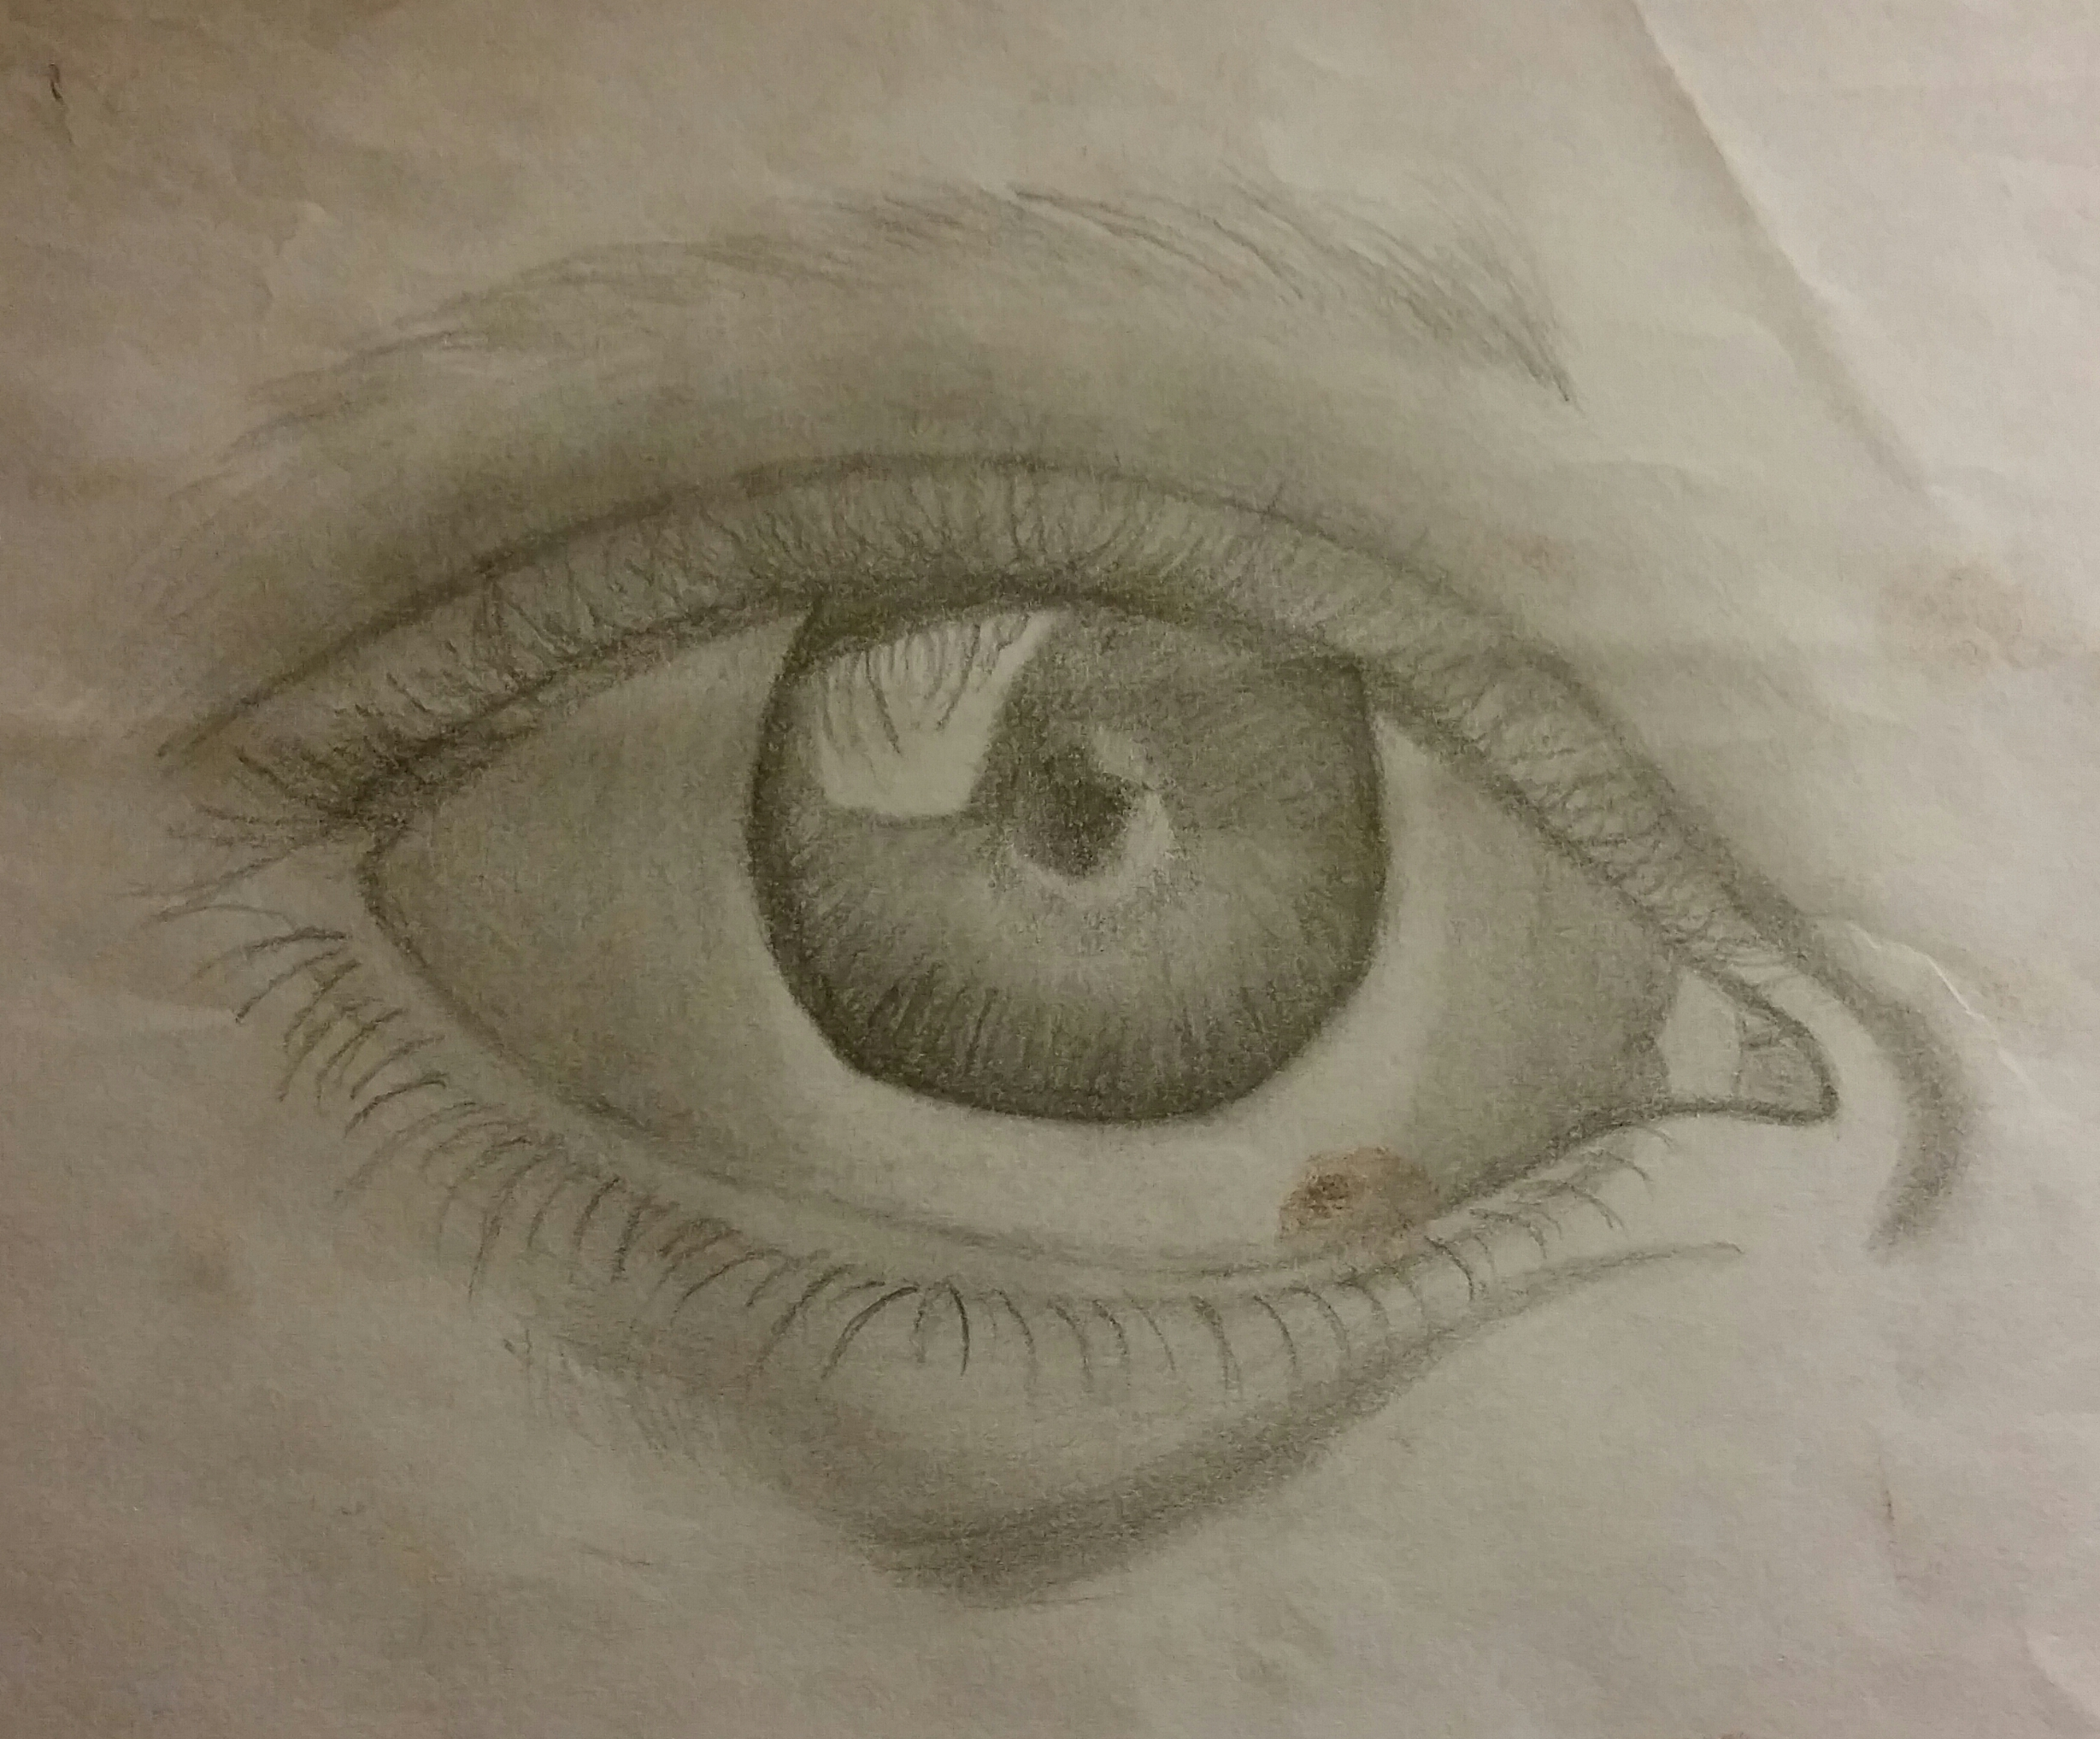 The Eye (in pencil)